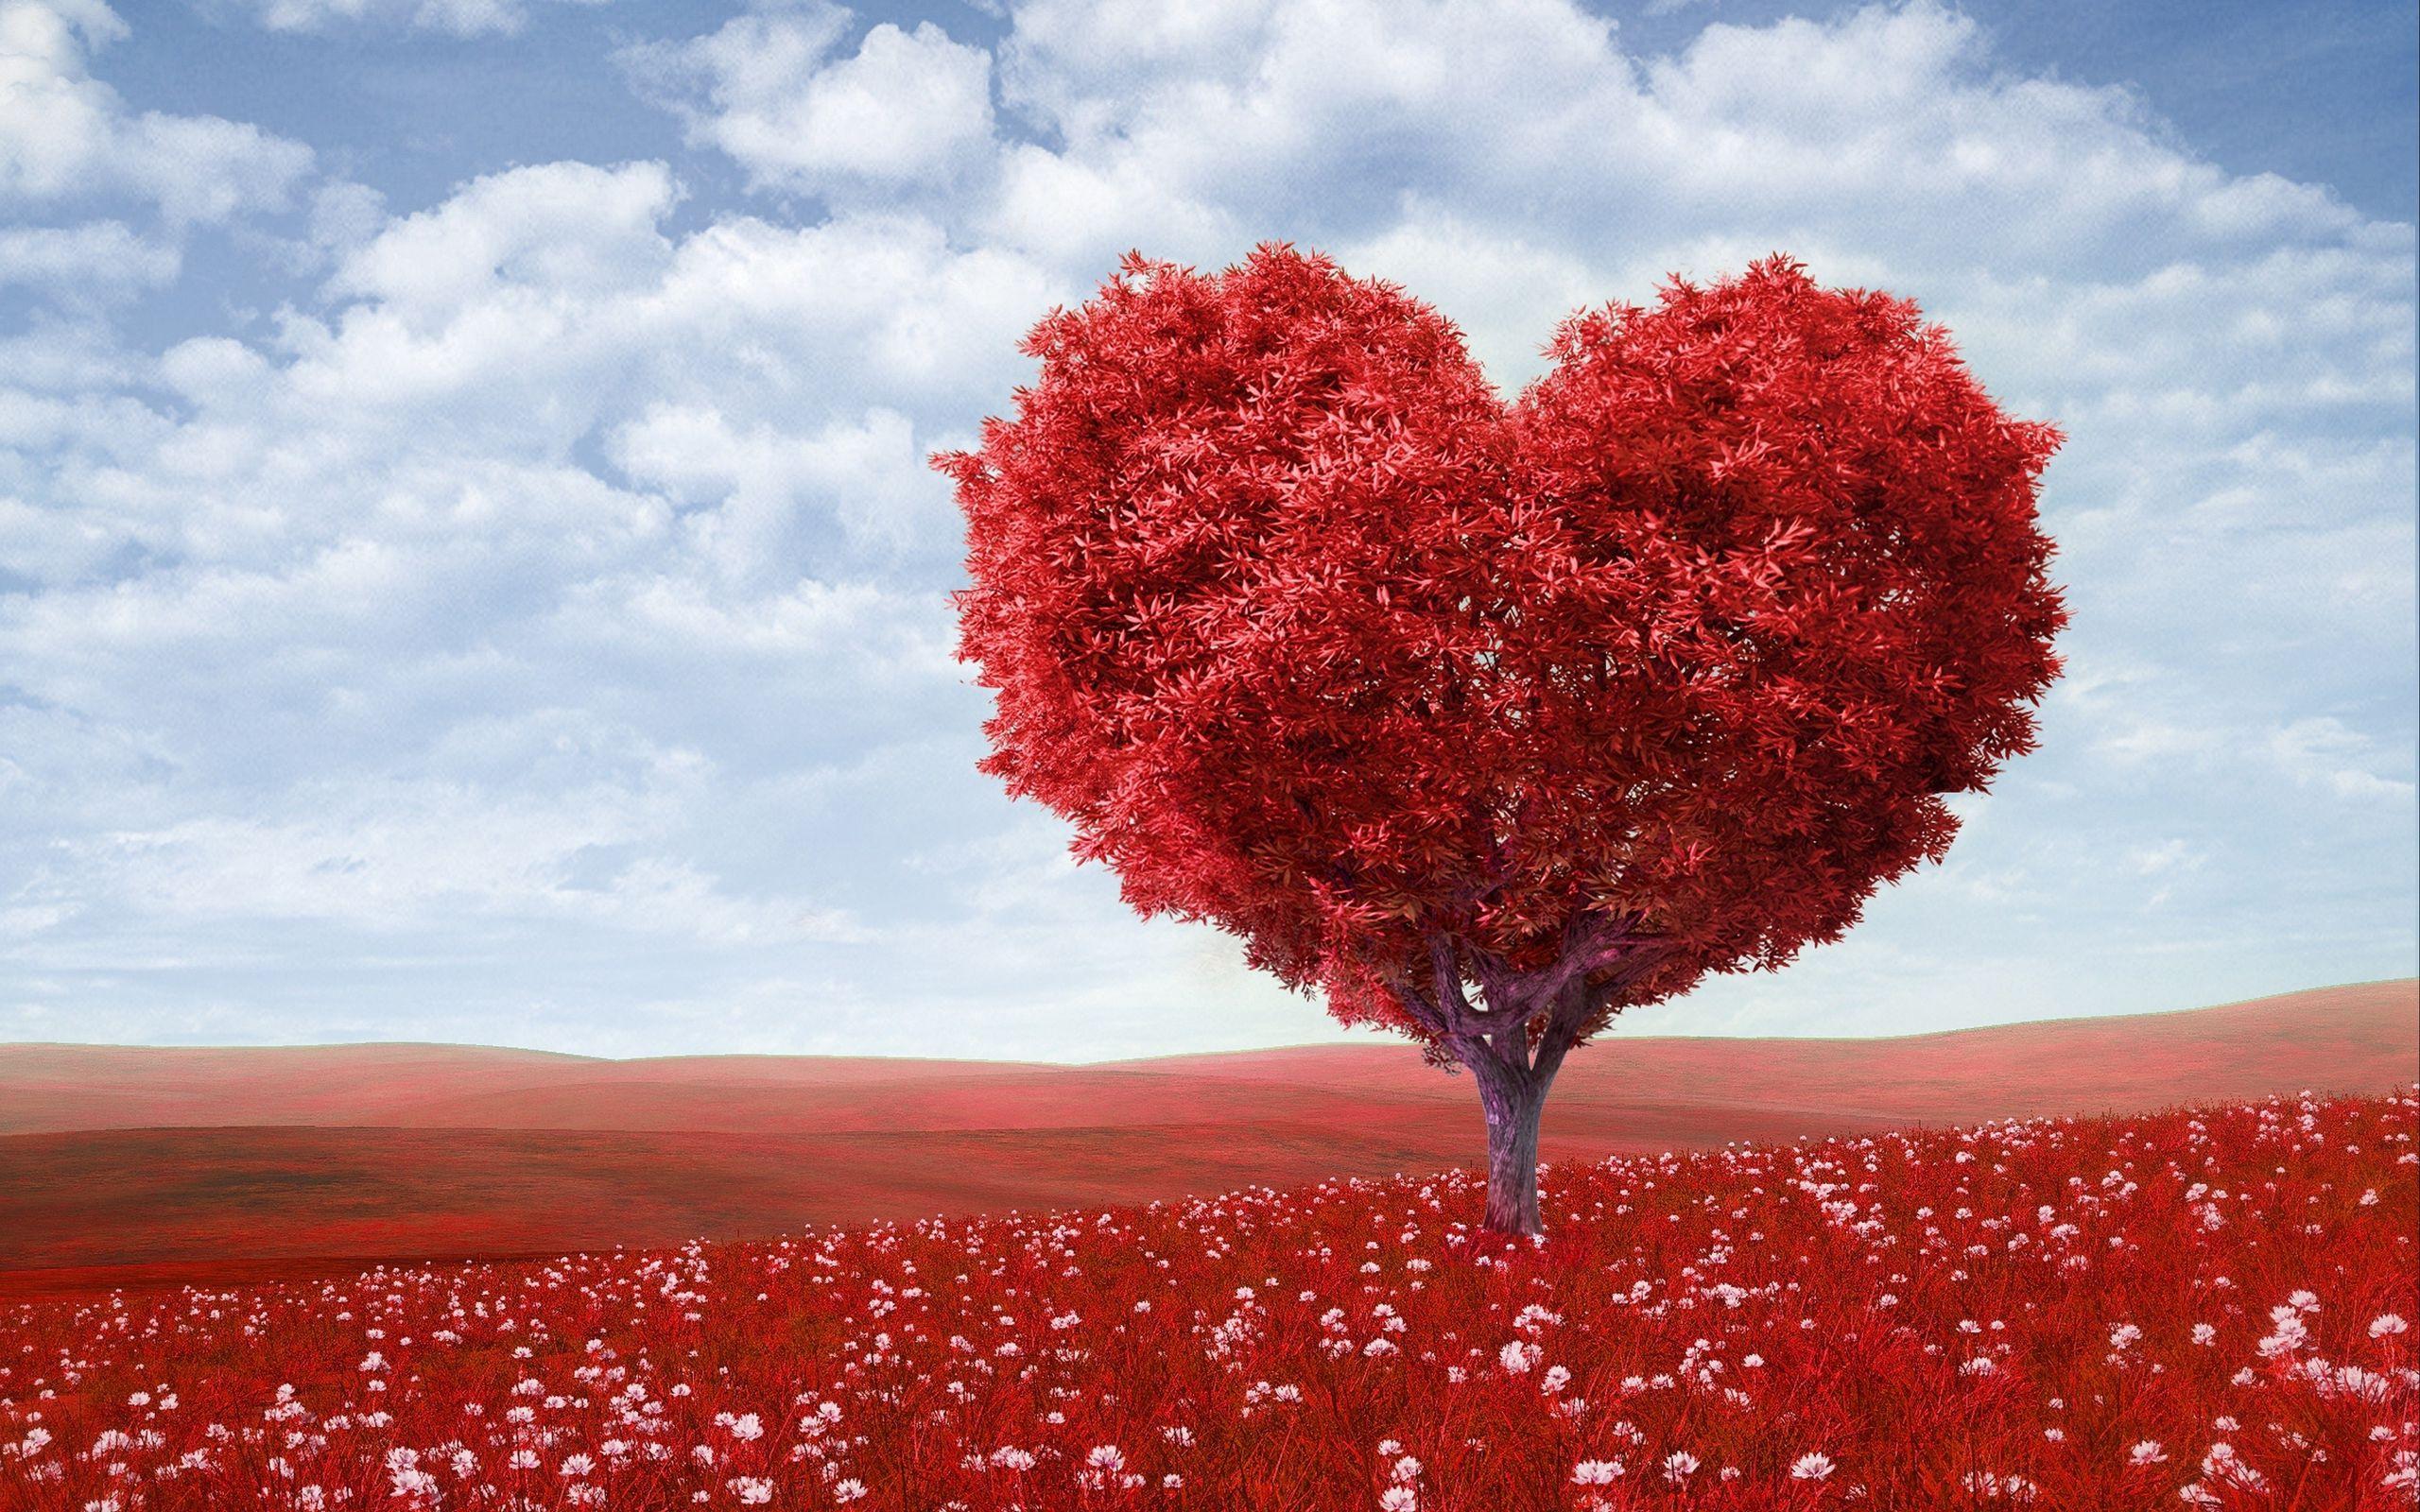 2560x1600 Wallpaper tree, heart, photoshop, field, grass, romance